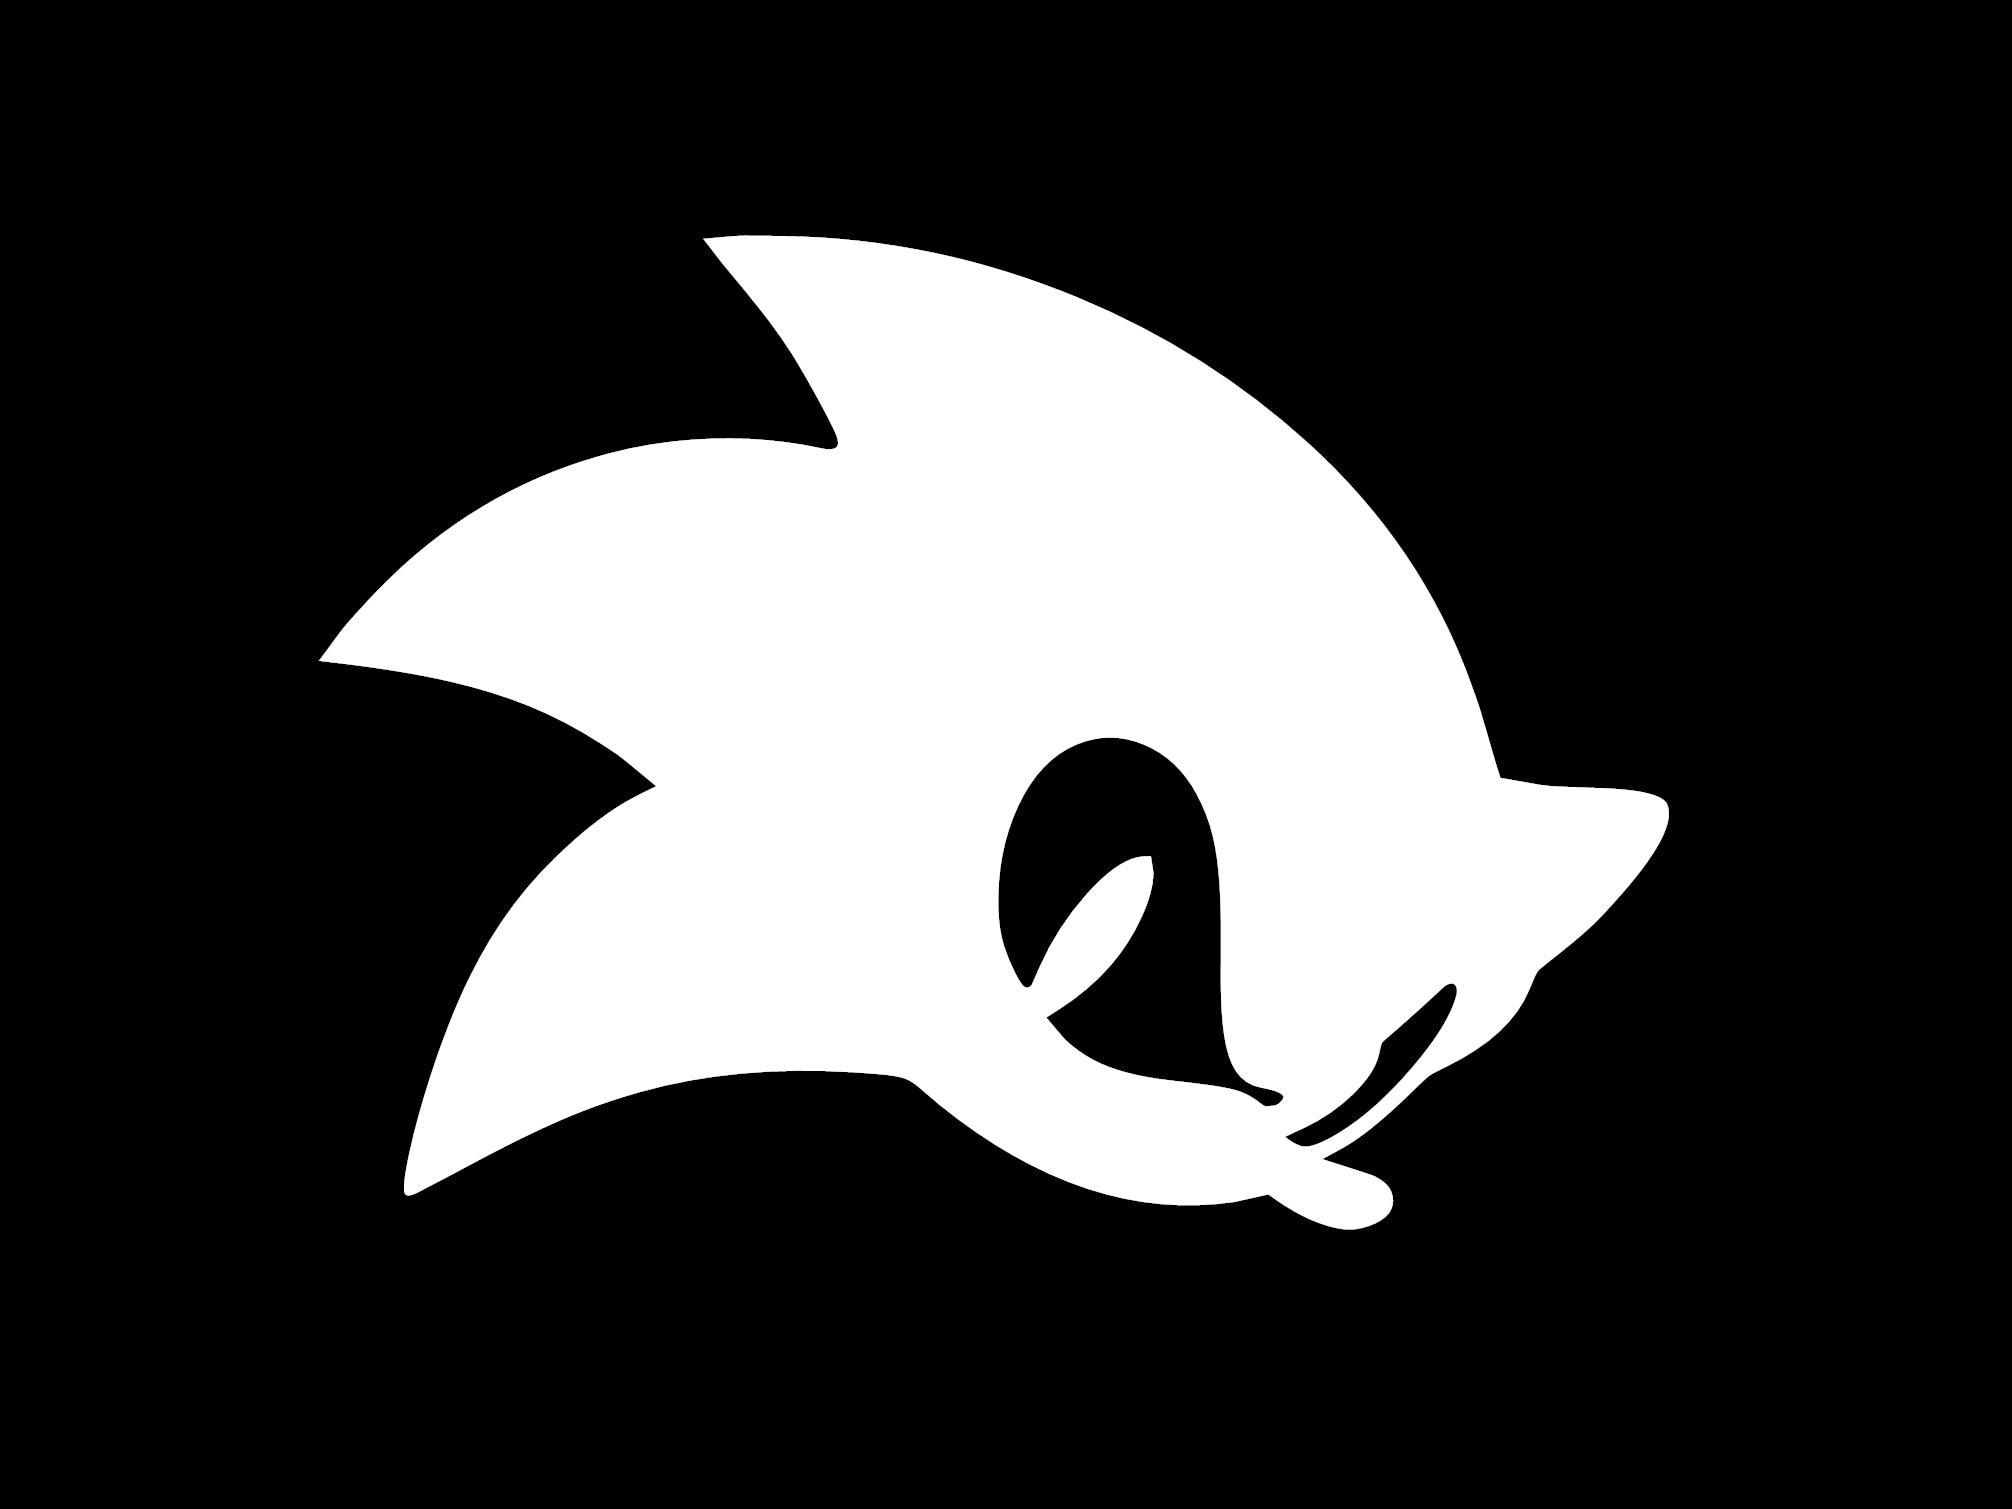 Sonic The Hedgehog Vinyl Decal Etsy